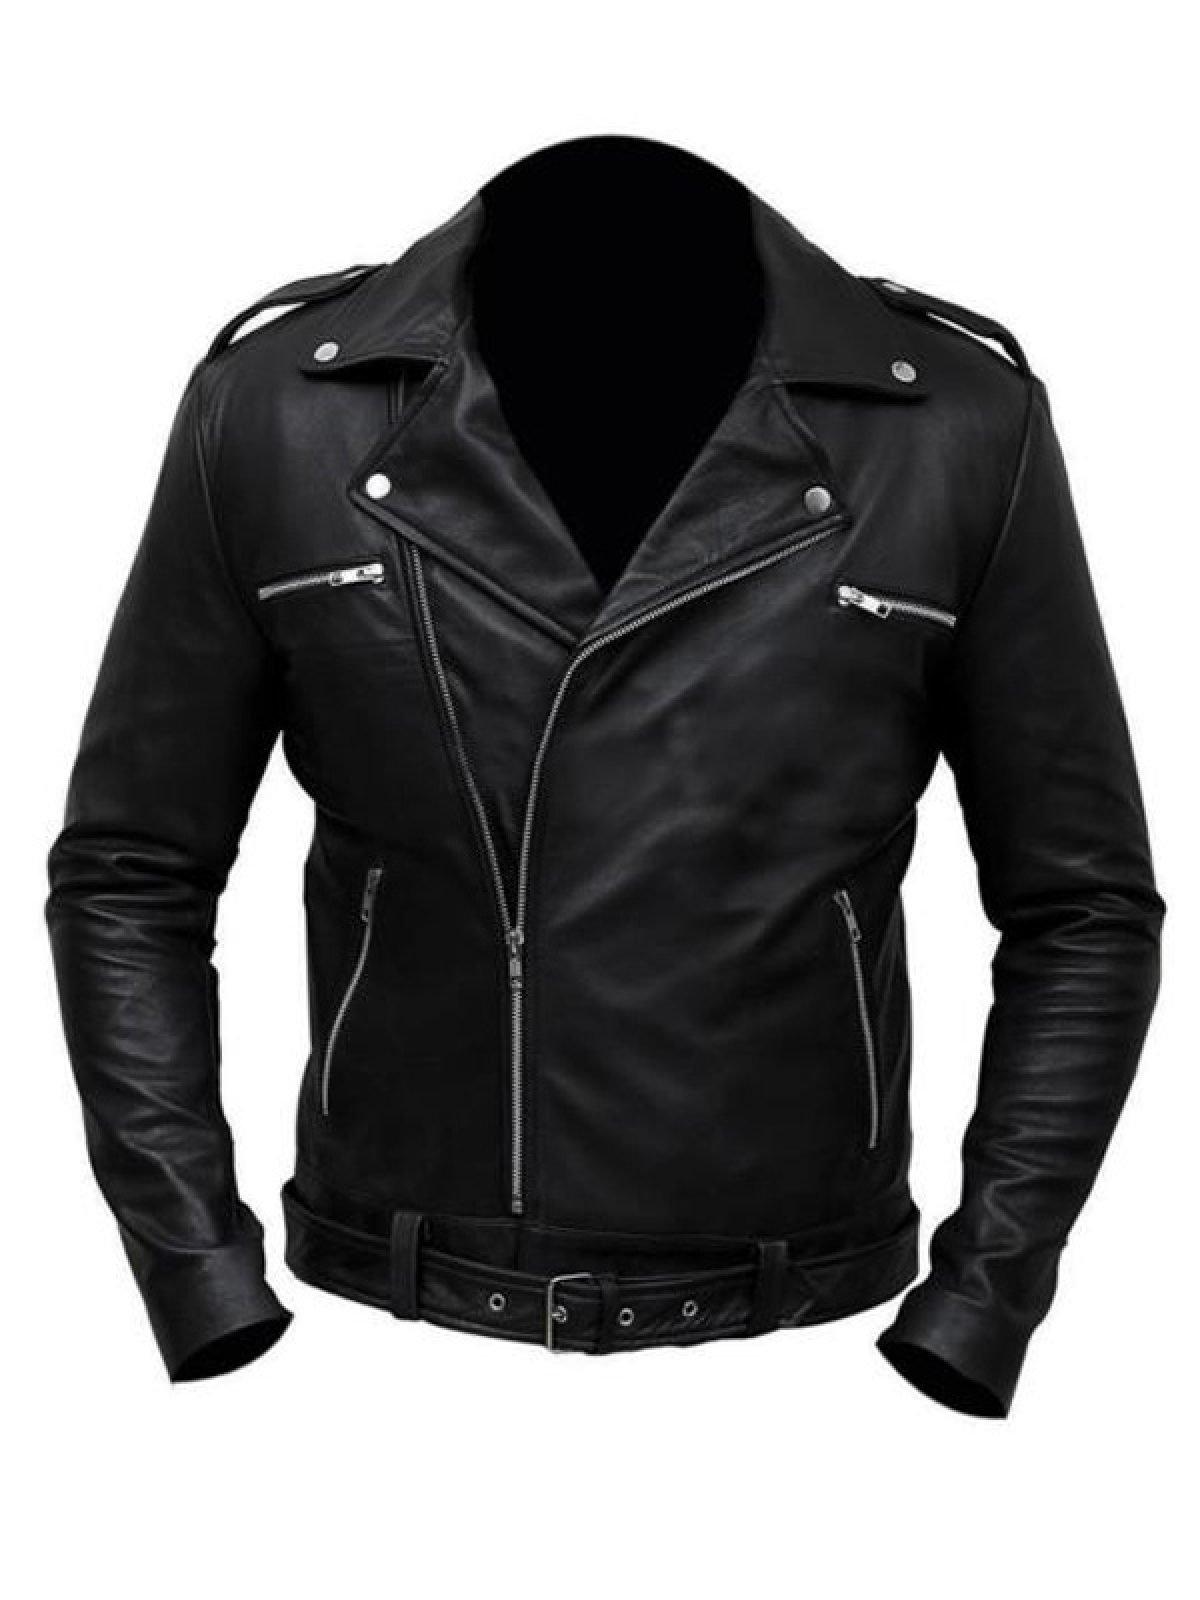 The Walking Dead TV Series Negan Leather Biker Jacket Black